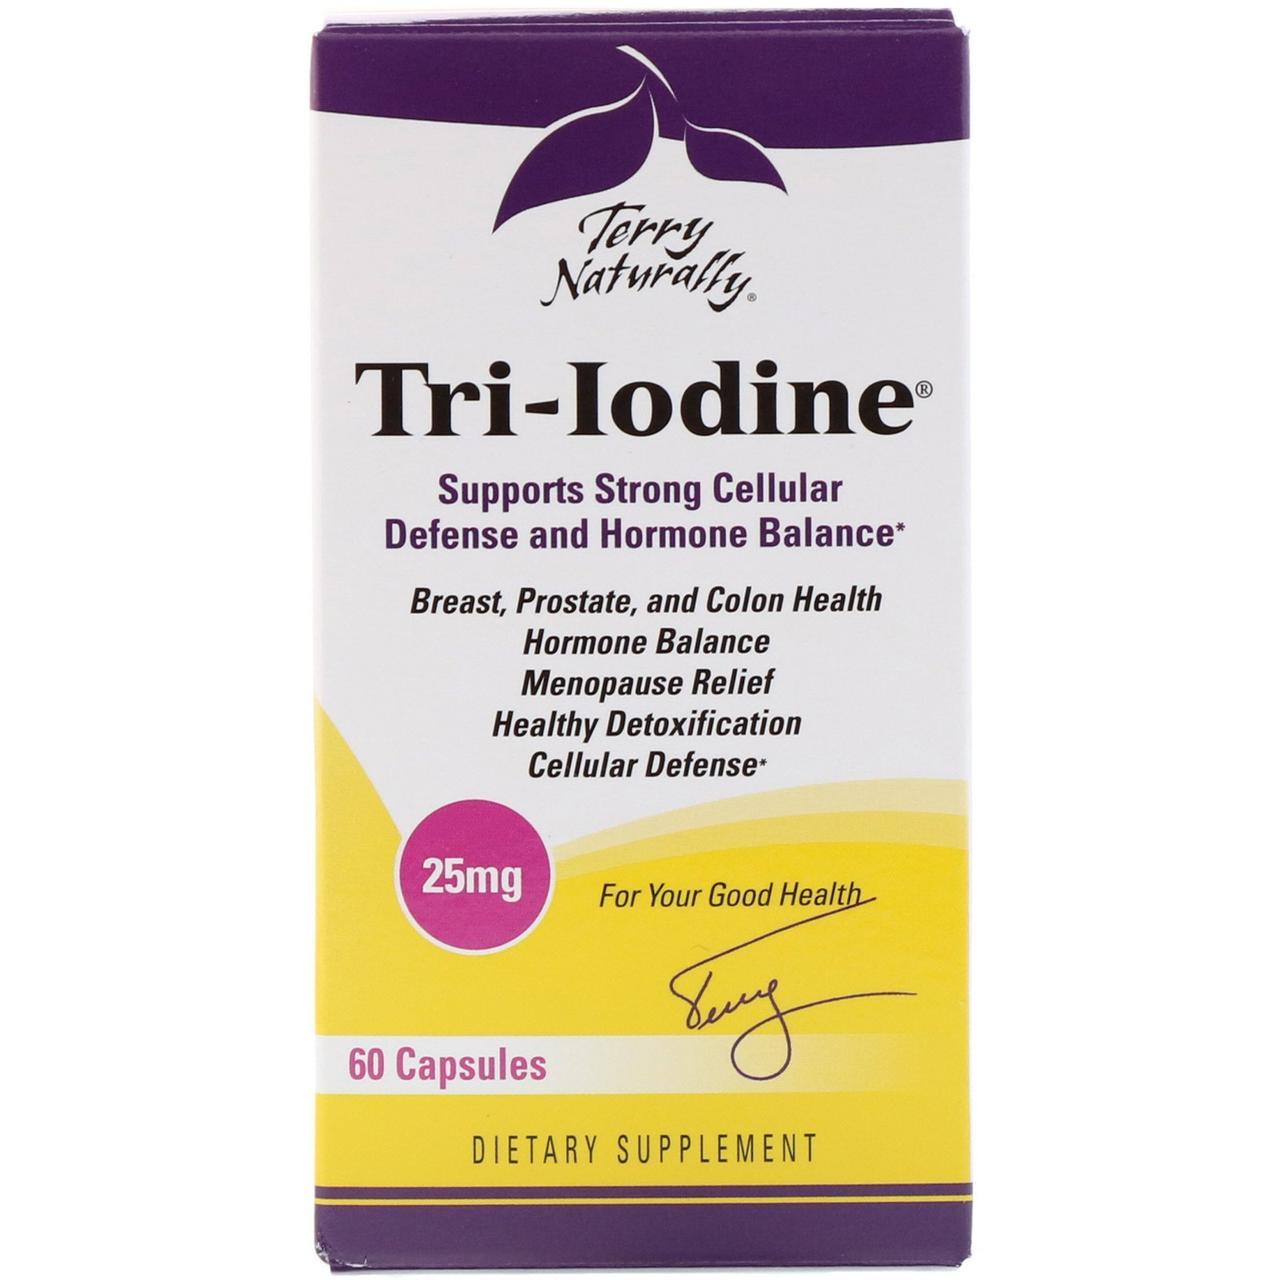 Капсулы Tri-Iodine от Terry Naturally и EuroPharma, 60 капсул